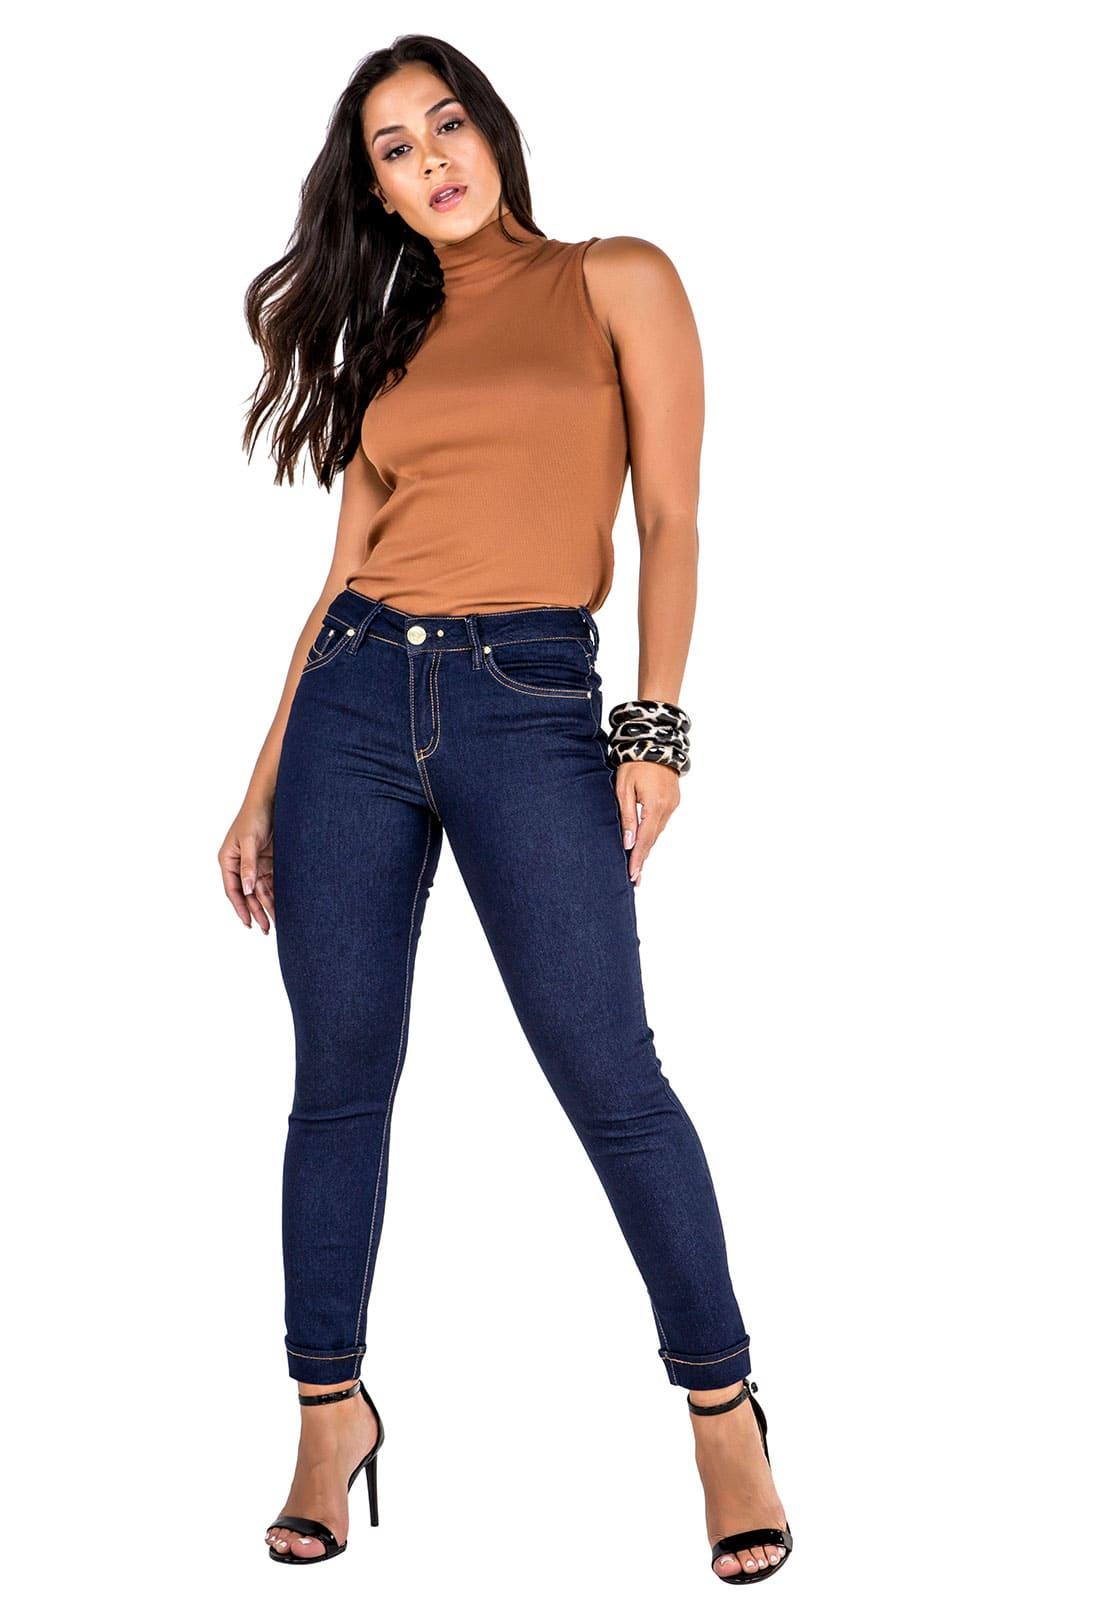 Calça Jeans Cropped Feminina Tradicional